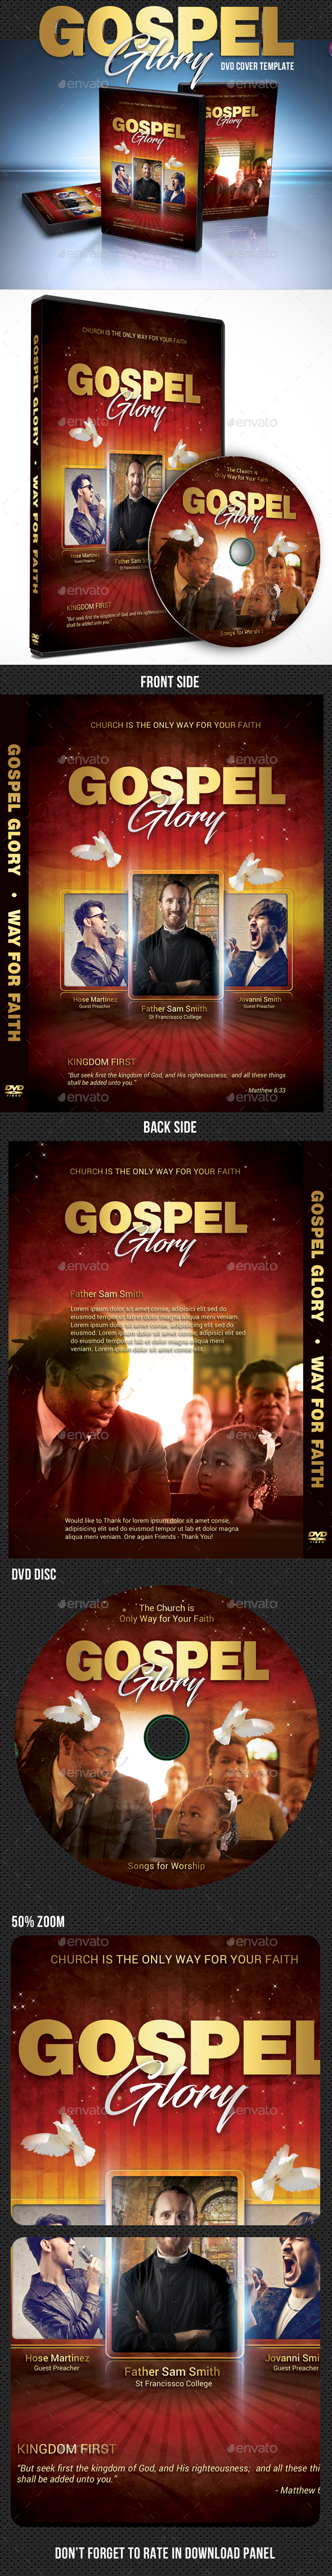 GraphicRiver Gospel Glory DVD Cover Template 20487804